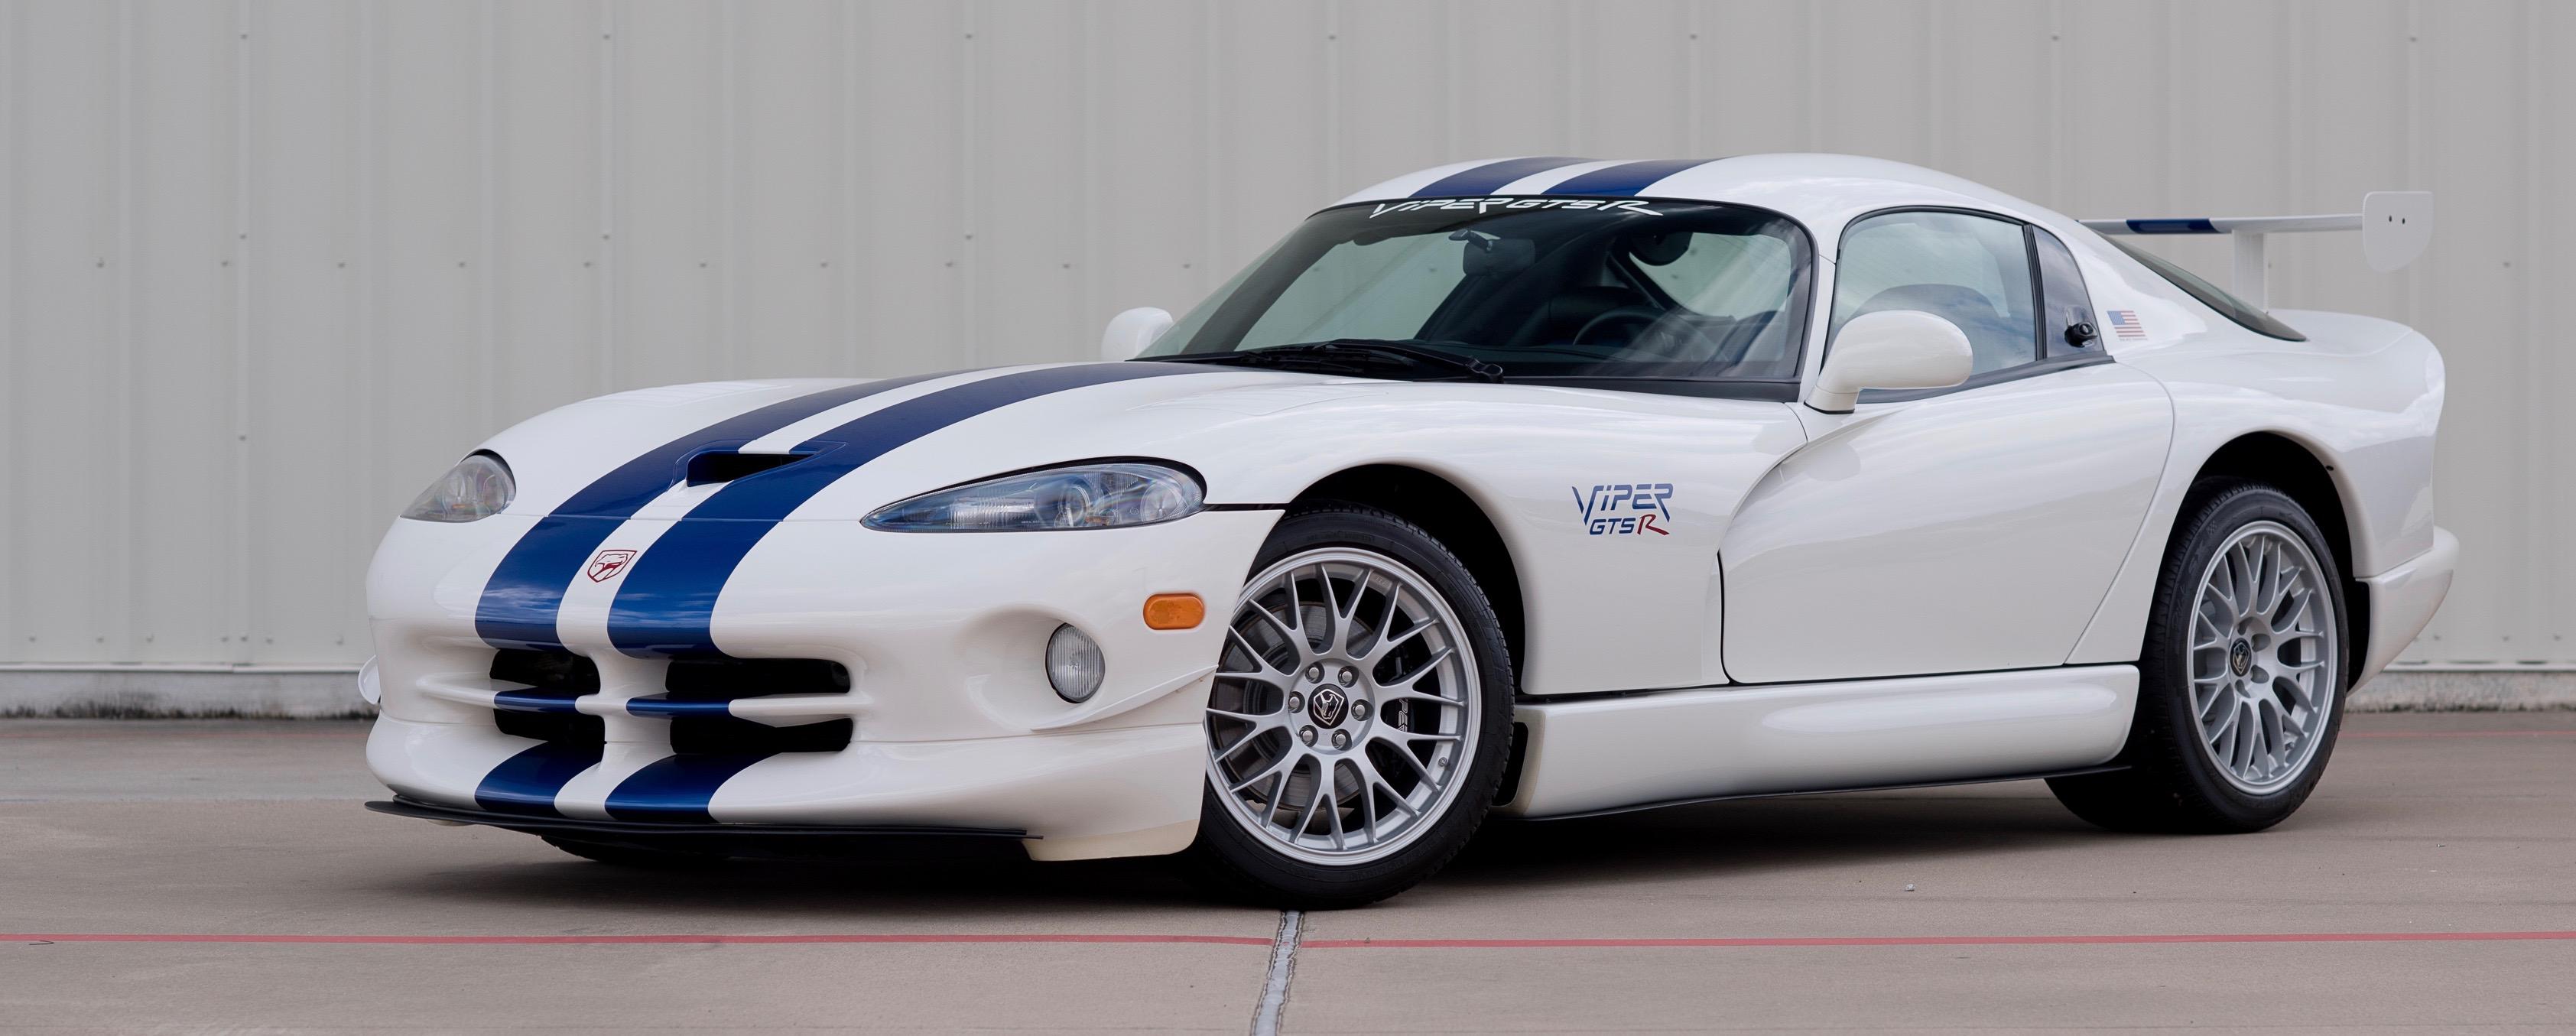 Mecum, Mecum to offer 1,000 vehicles at Houston, ClassicCars.com Journal